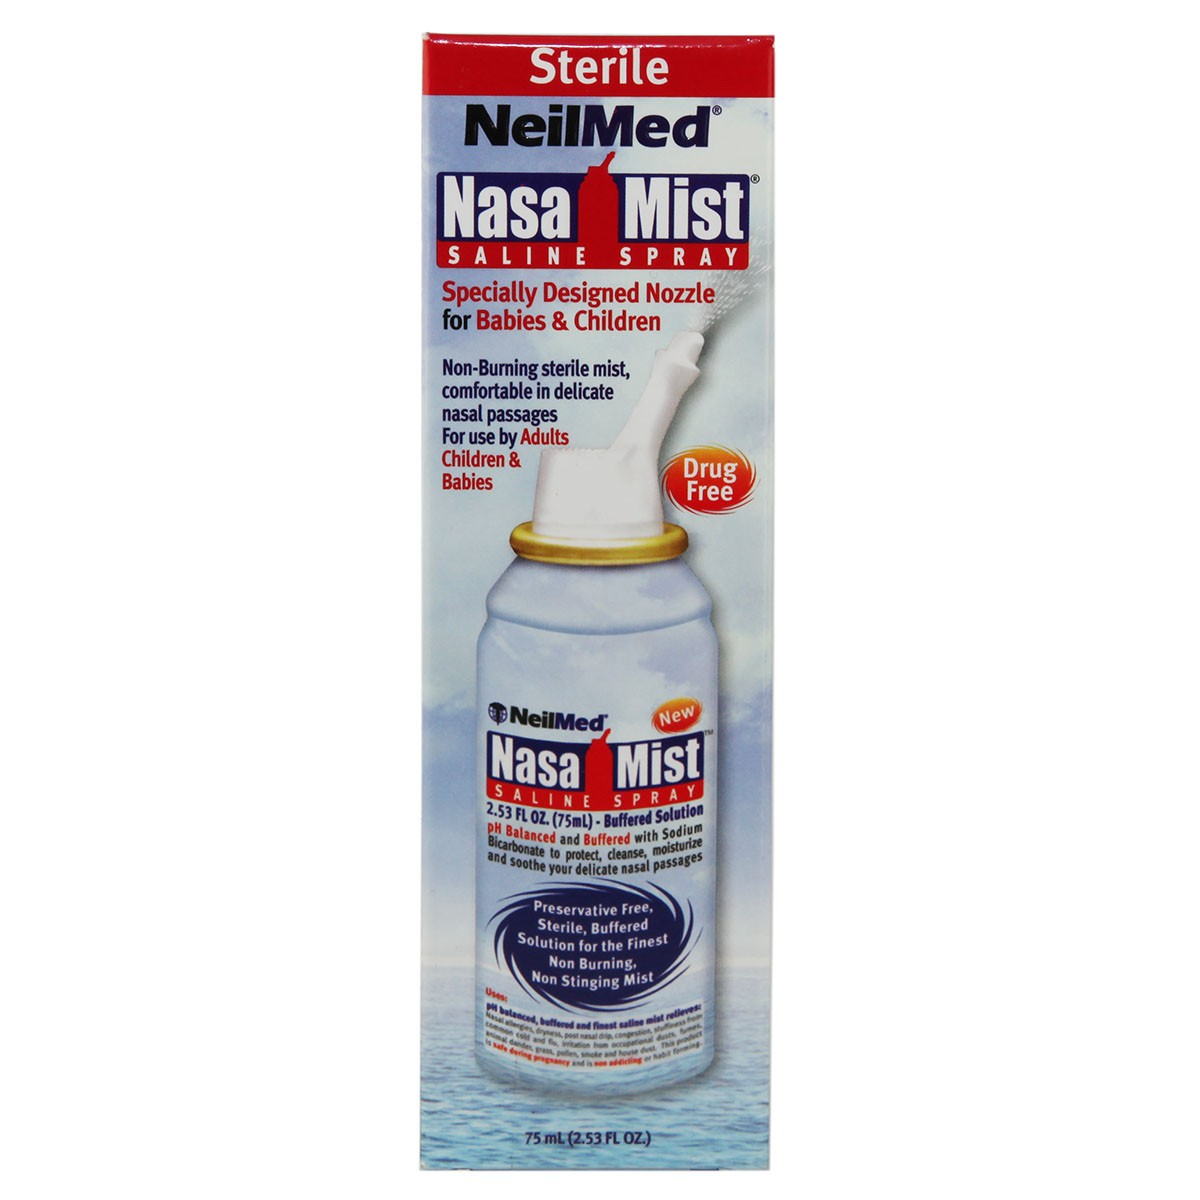 NeilMed NasaMist Saline Spray( Adults & Children)